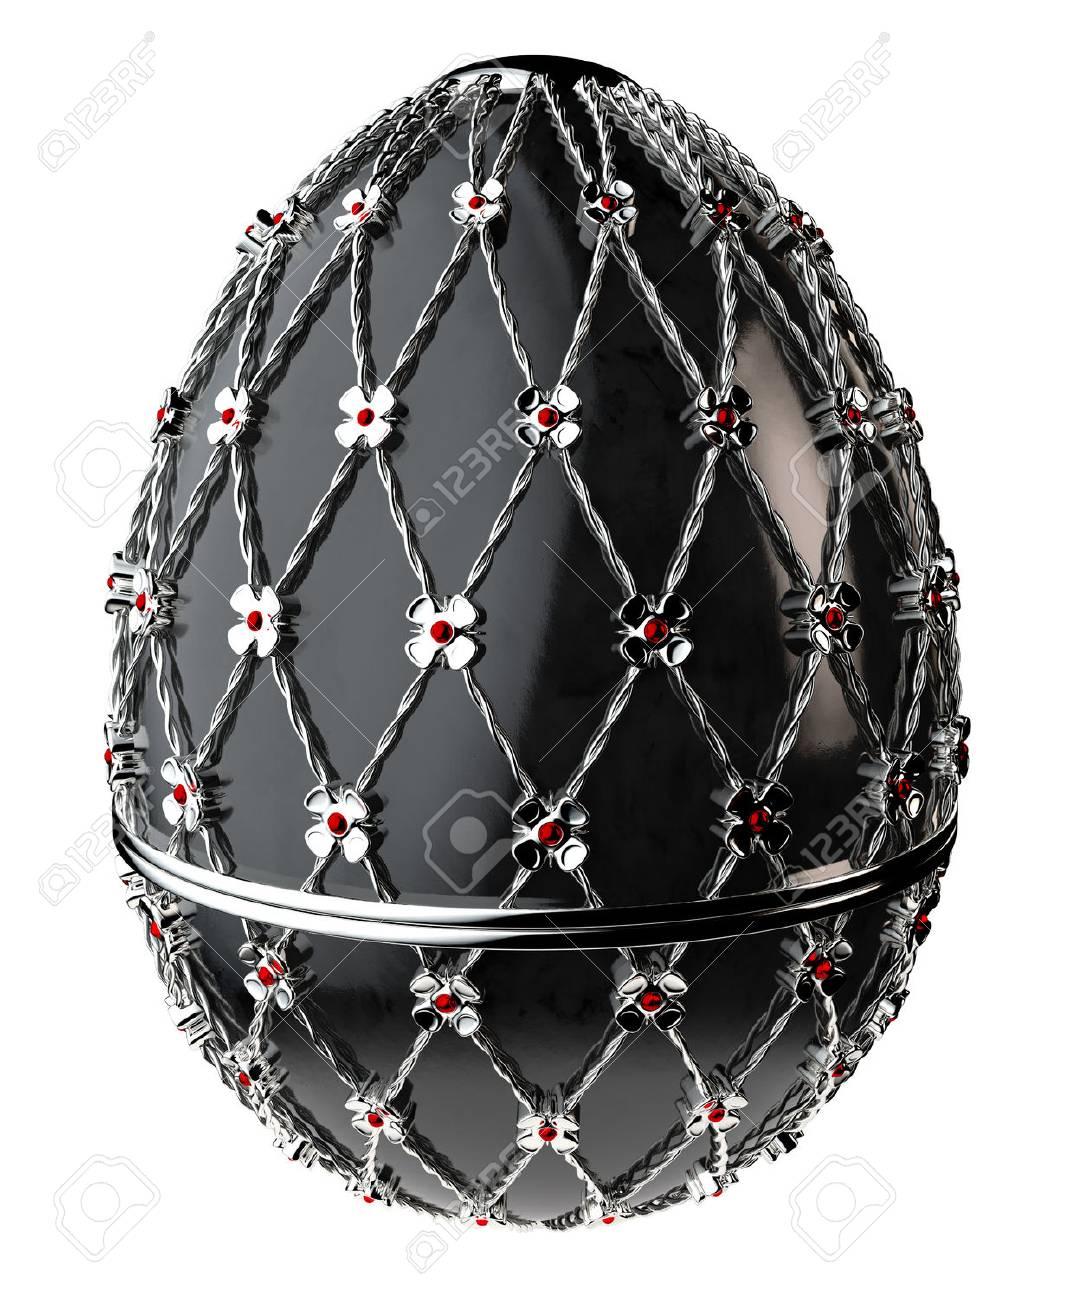 Jewelry egg. 3D render. Stock Photo - 75878315